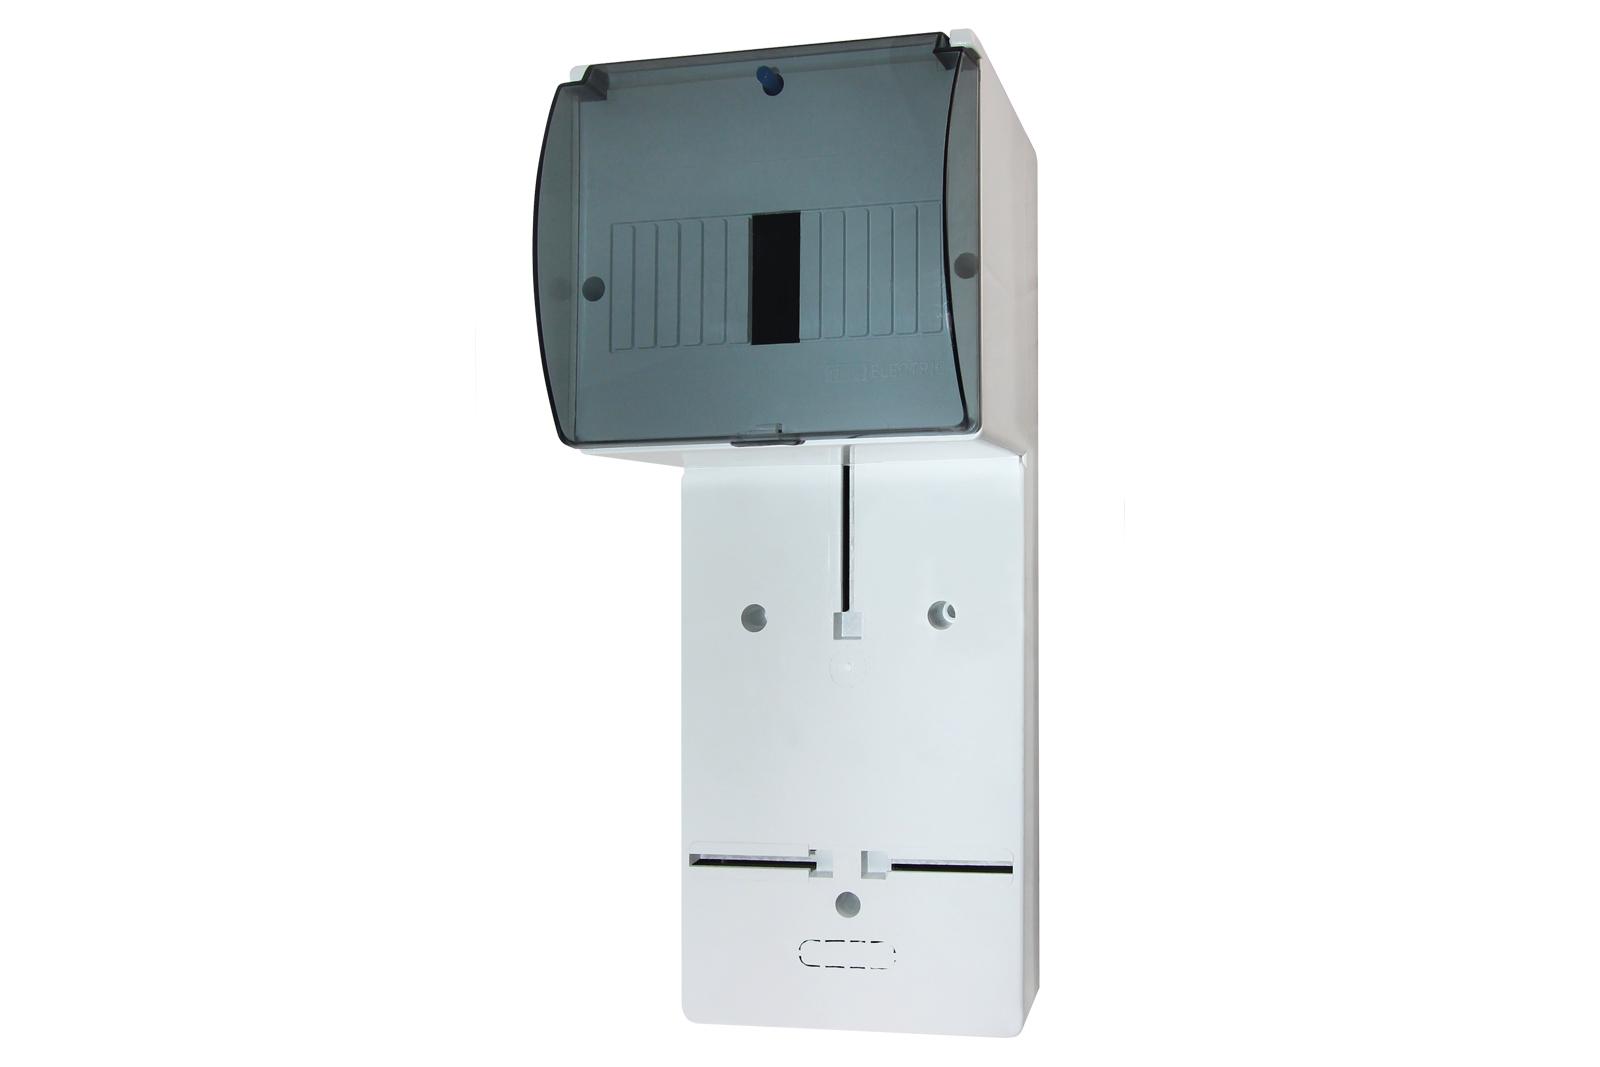 Панель Tdm Sq0909-0004 монитор blaсkview tdm 500 на панель